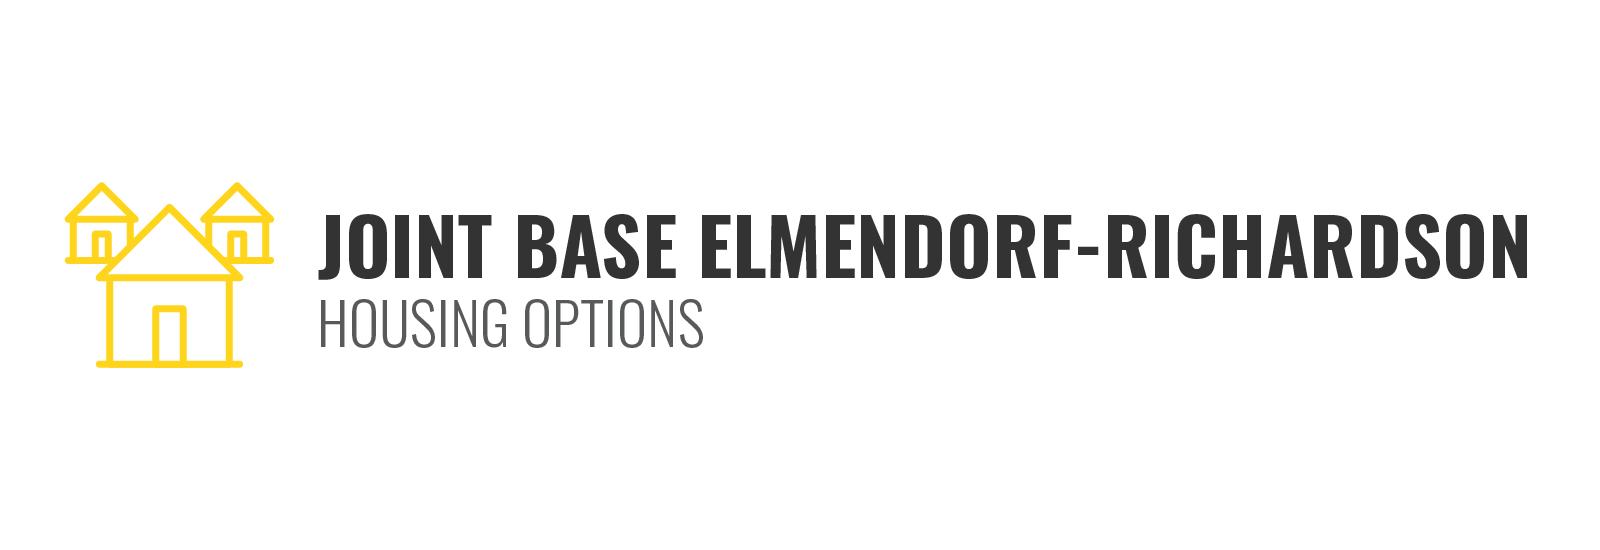 Joint Base Elmendorf-Richardson Housing Options